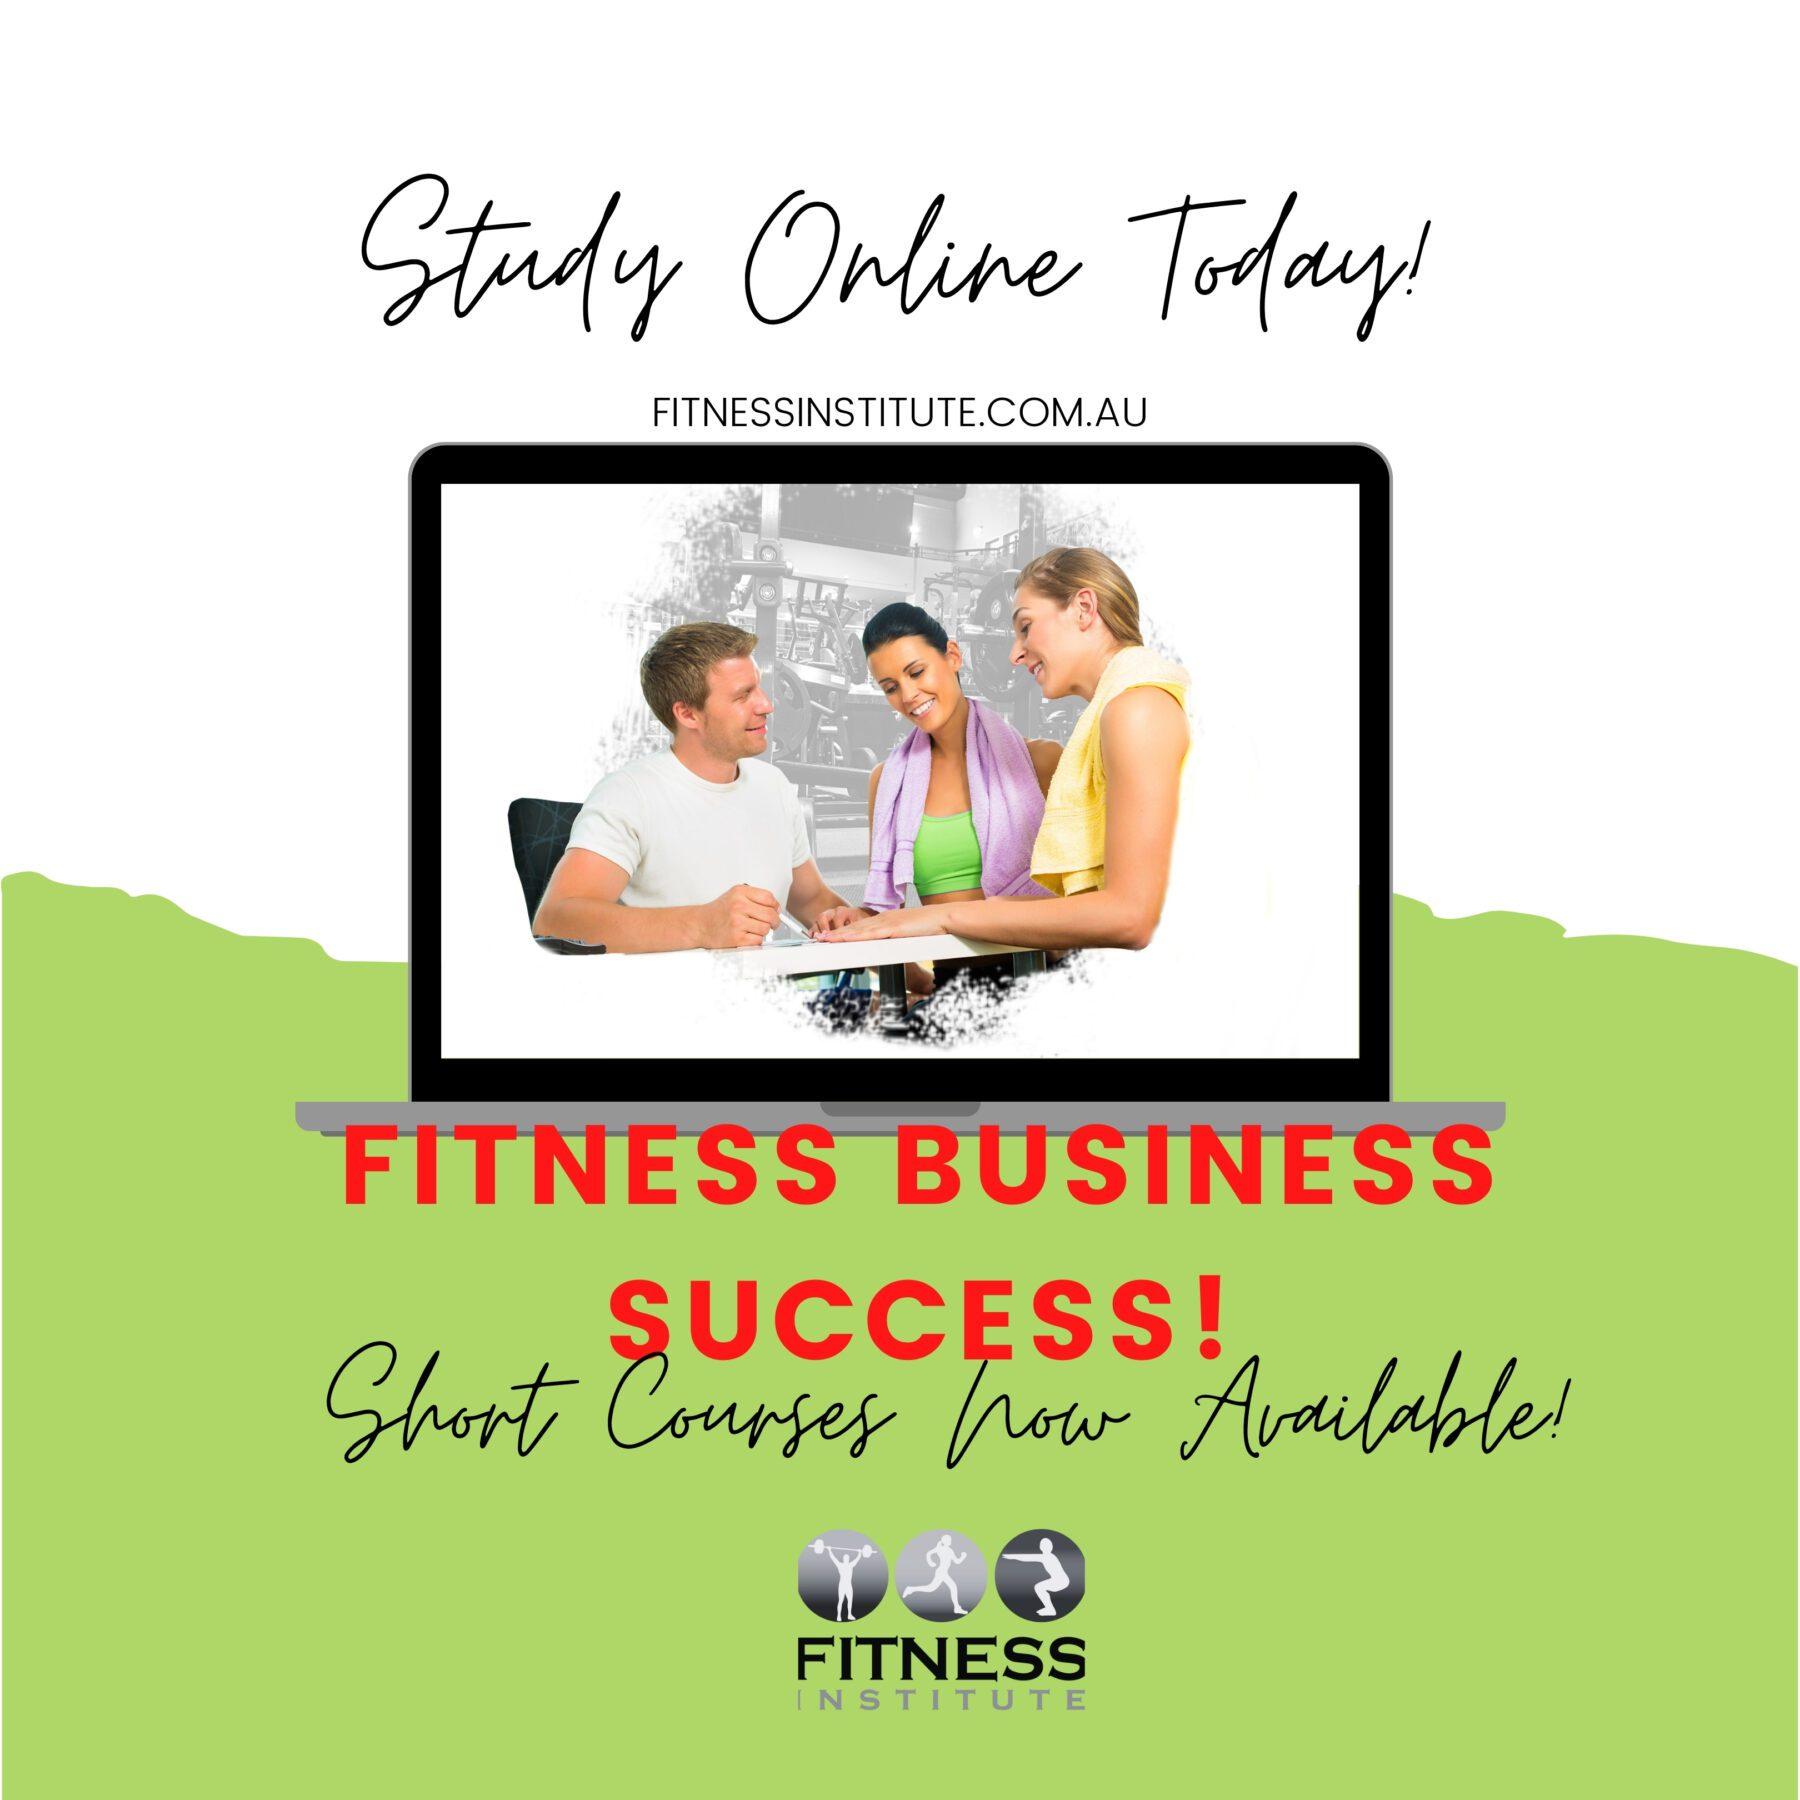 Fitness Business Success!